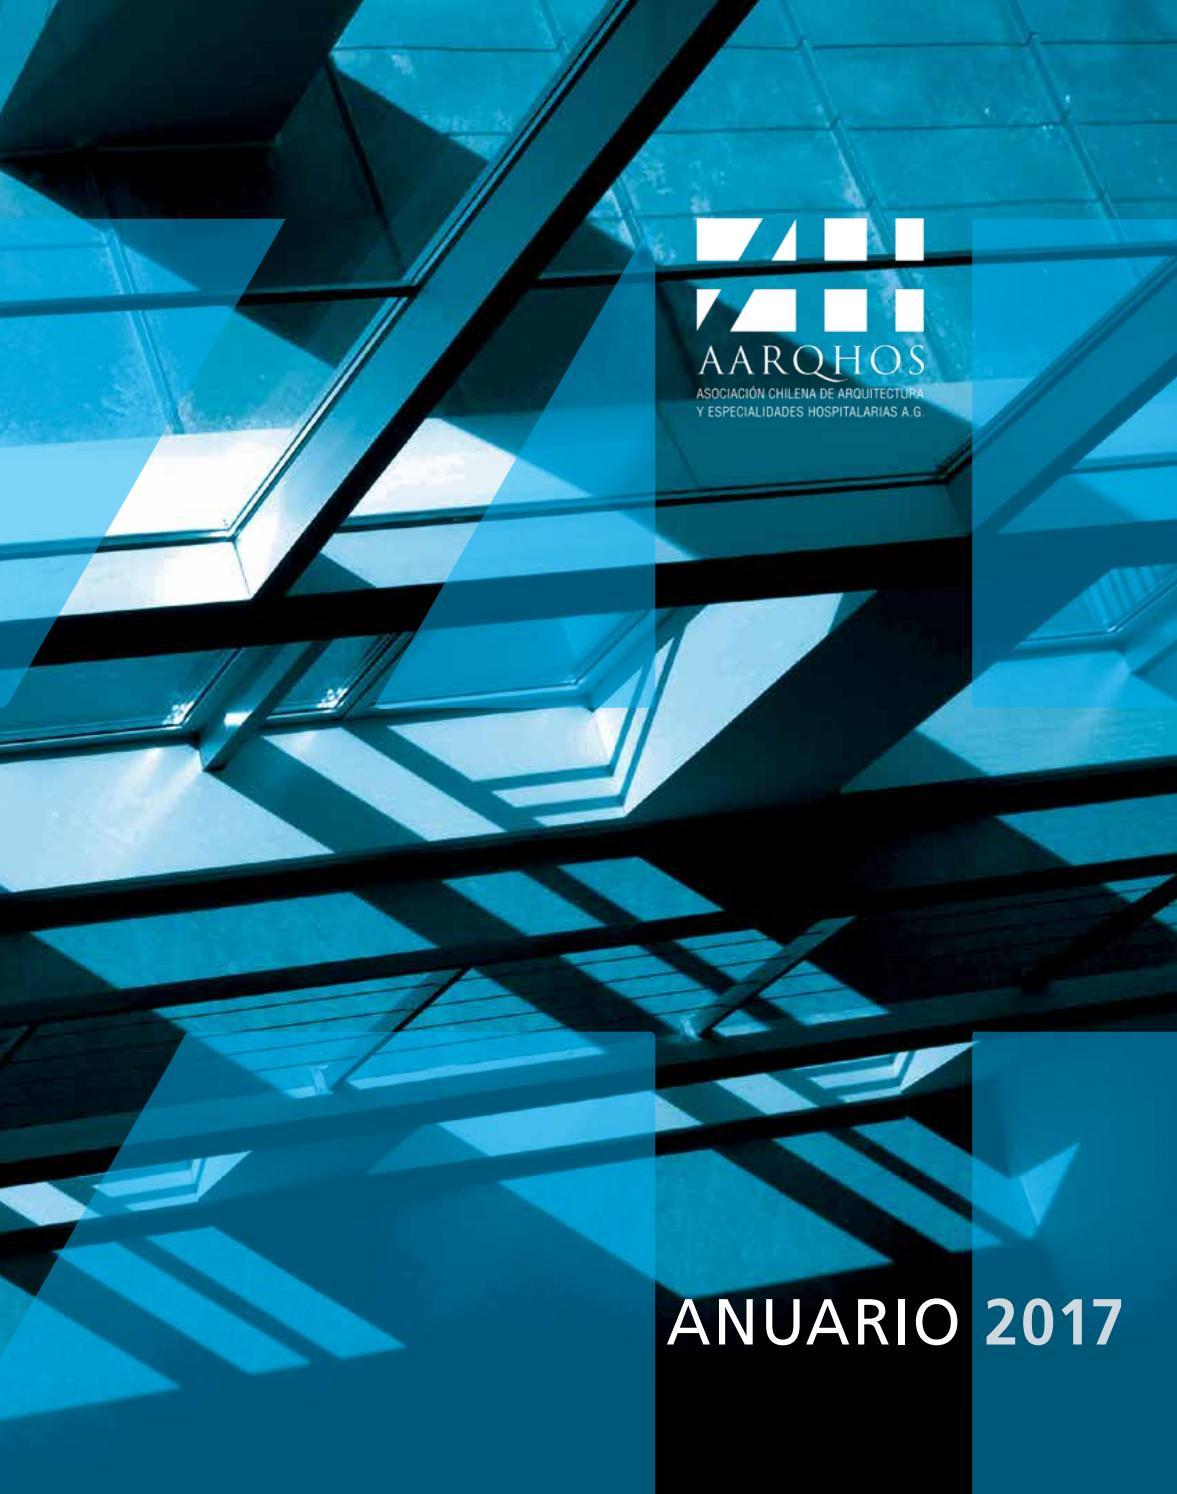 Anuario aarqhos edicion final 2017 by denise pichara - issuu